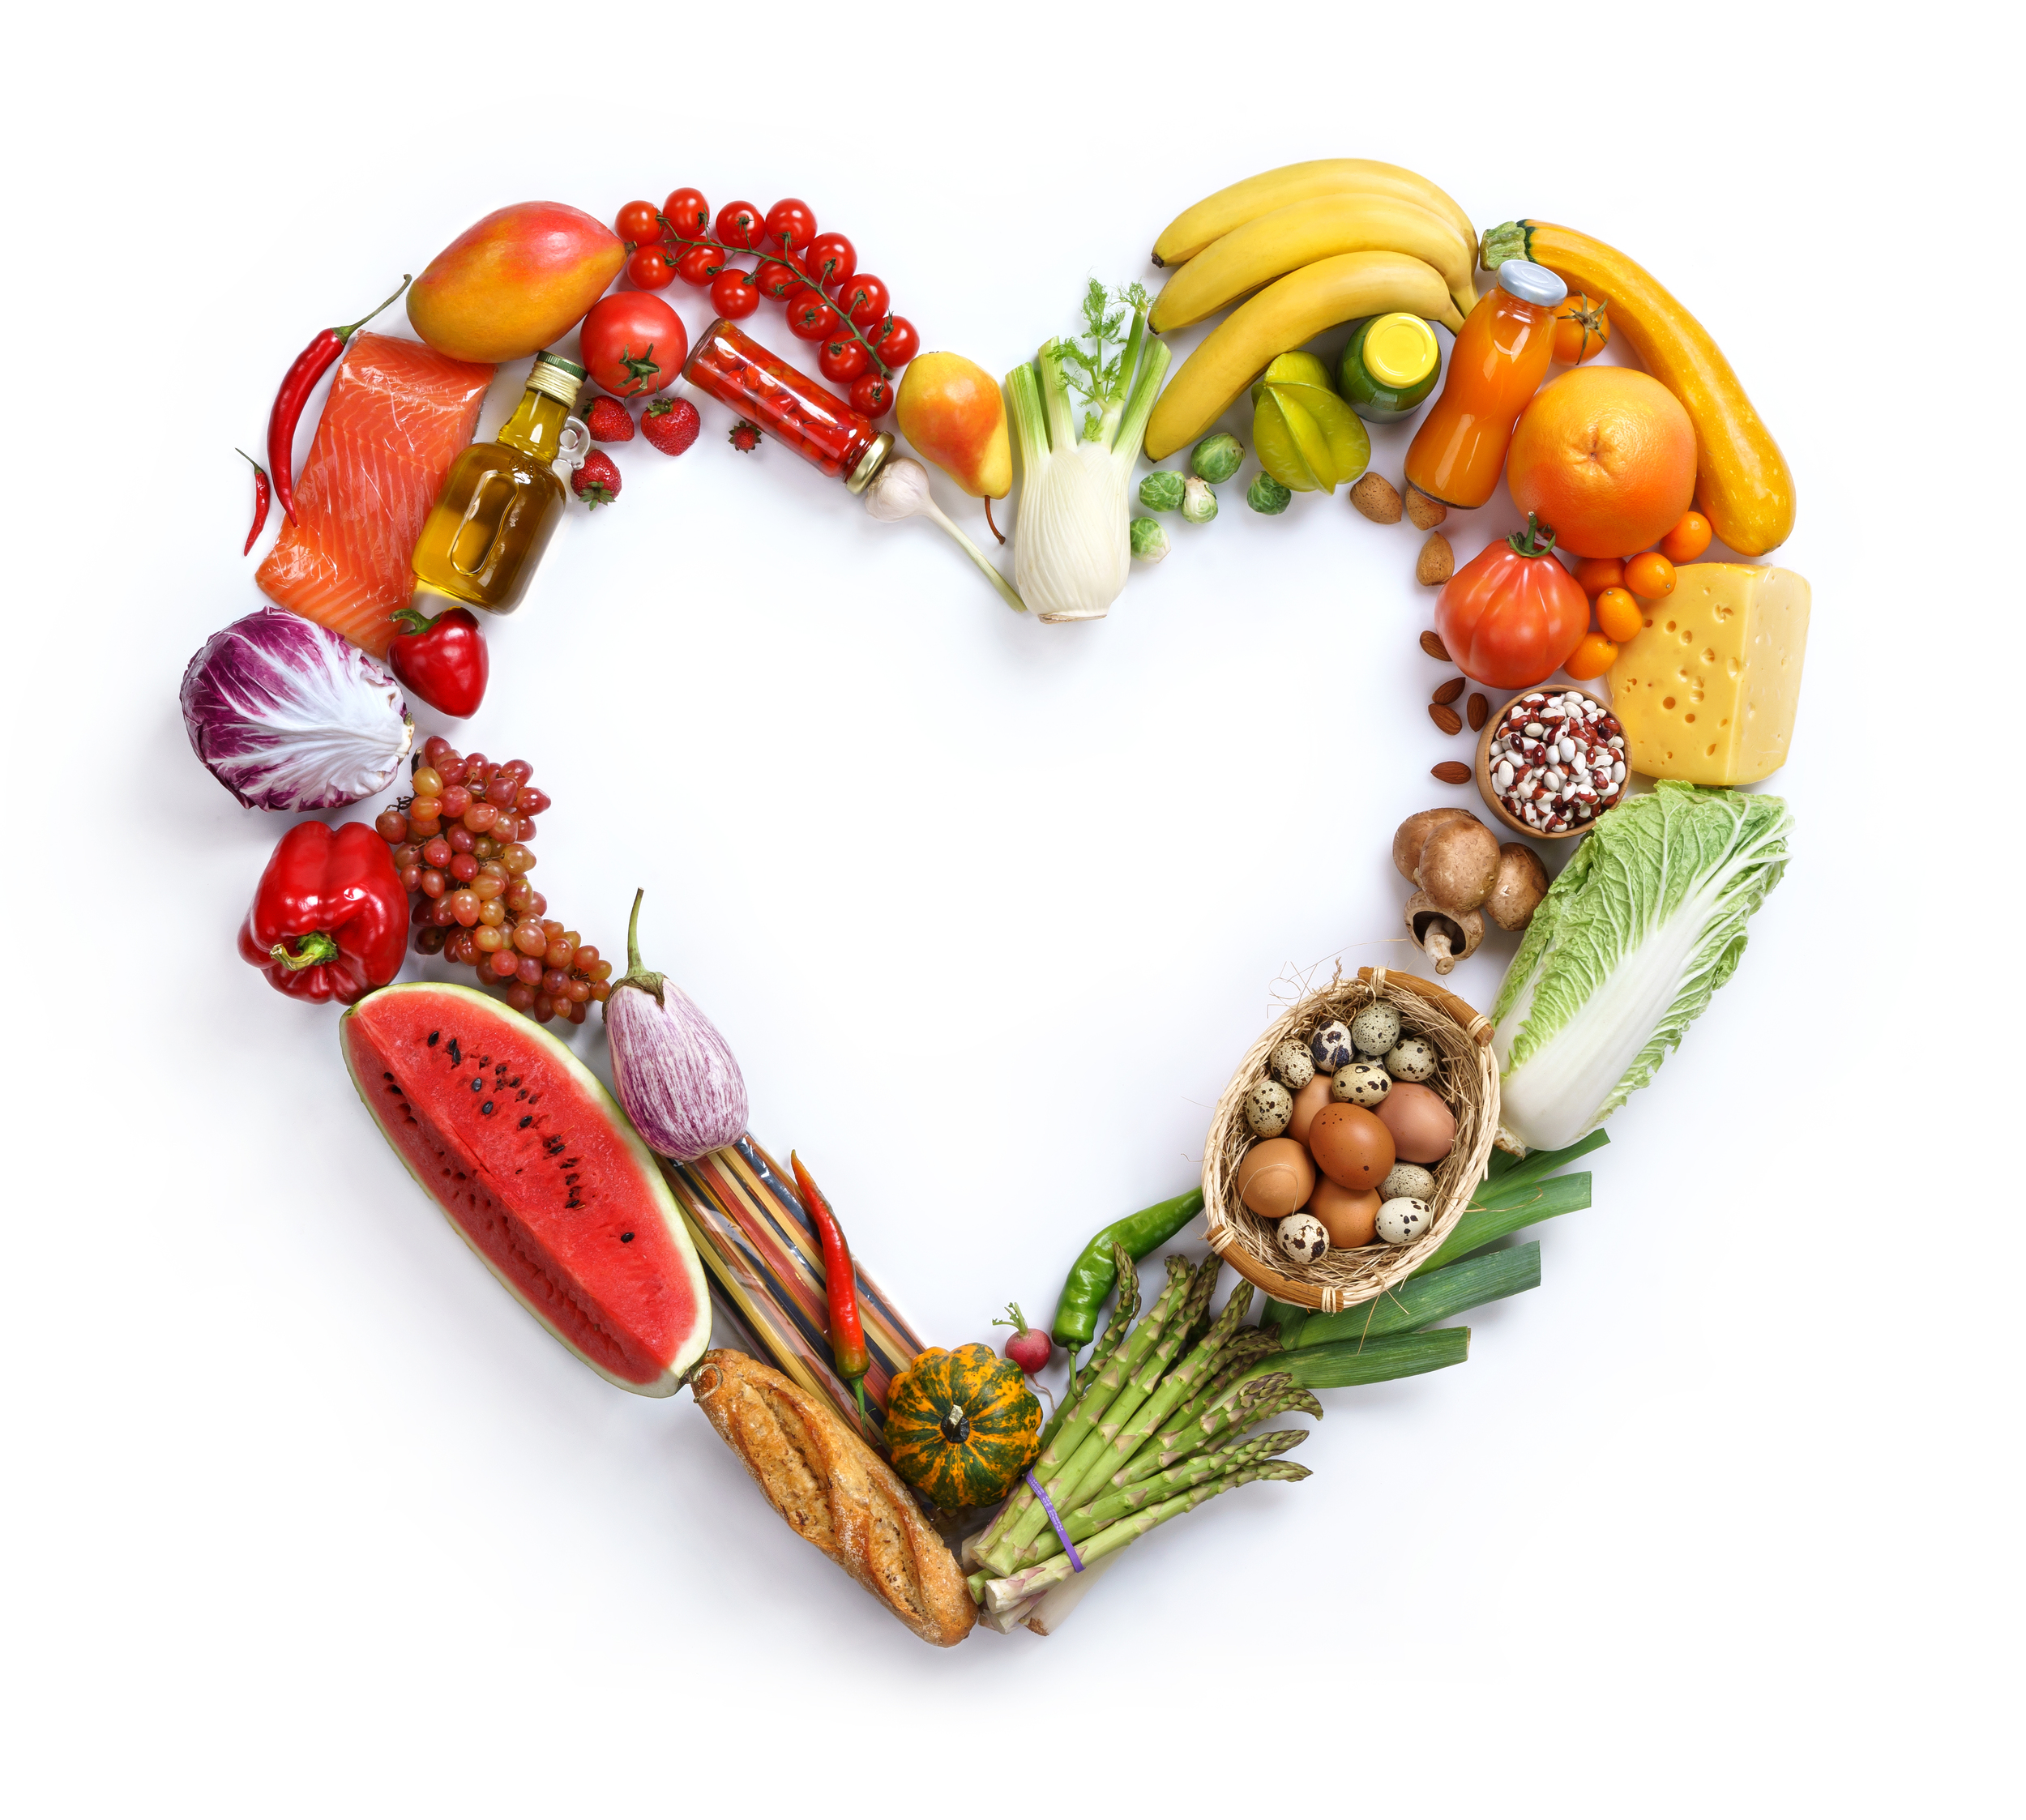 diet, healthy eating, paleo, fit eating